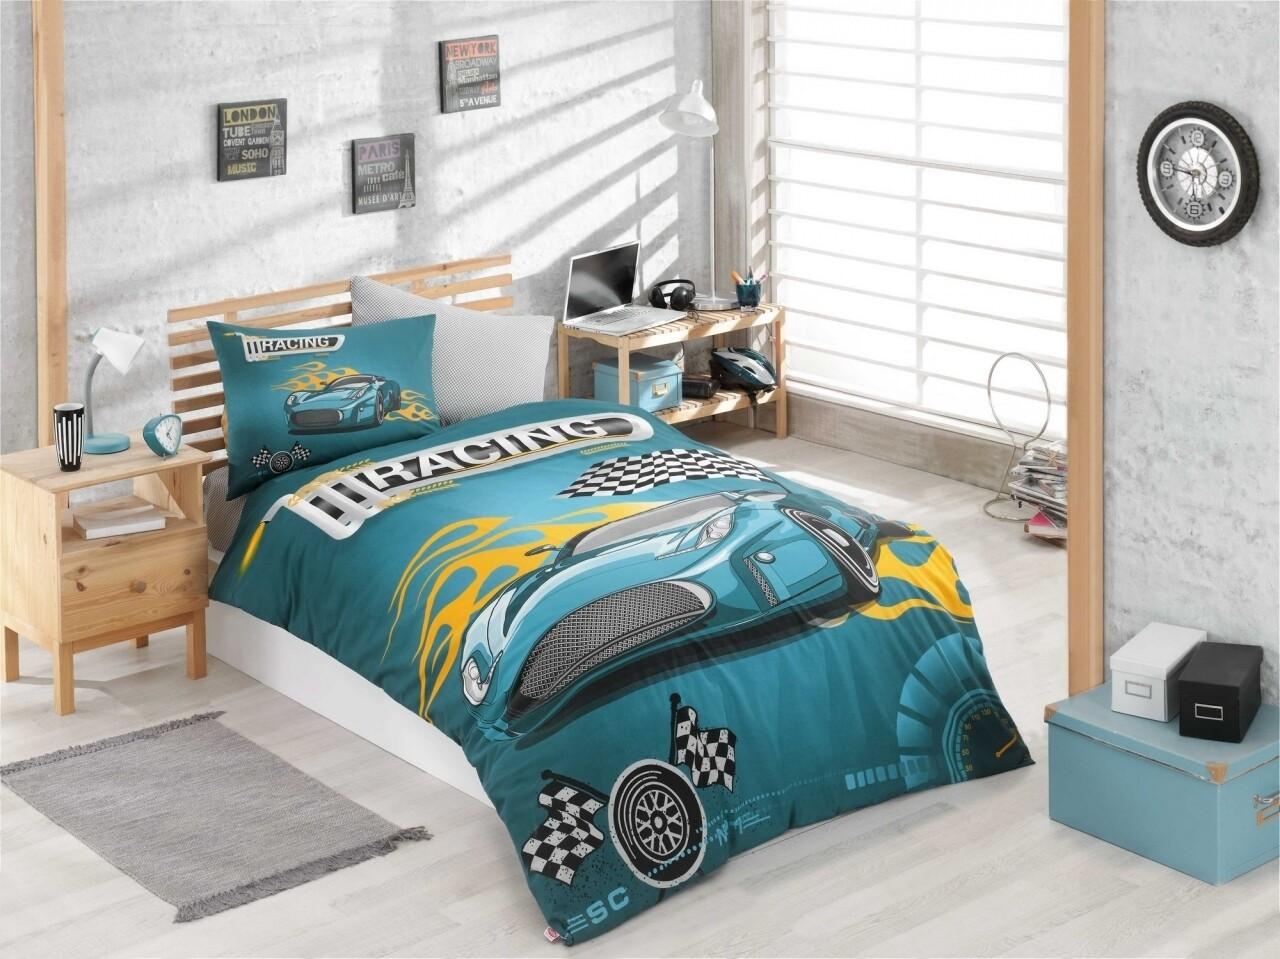 Lenjerie de pat pentru o persoana, 3 piese, 100% bumbac ranforce, Hobby, Racing, turcoaz